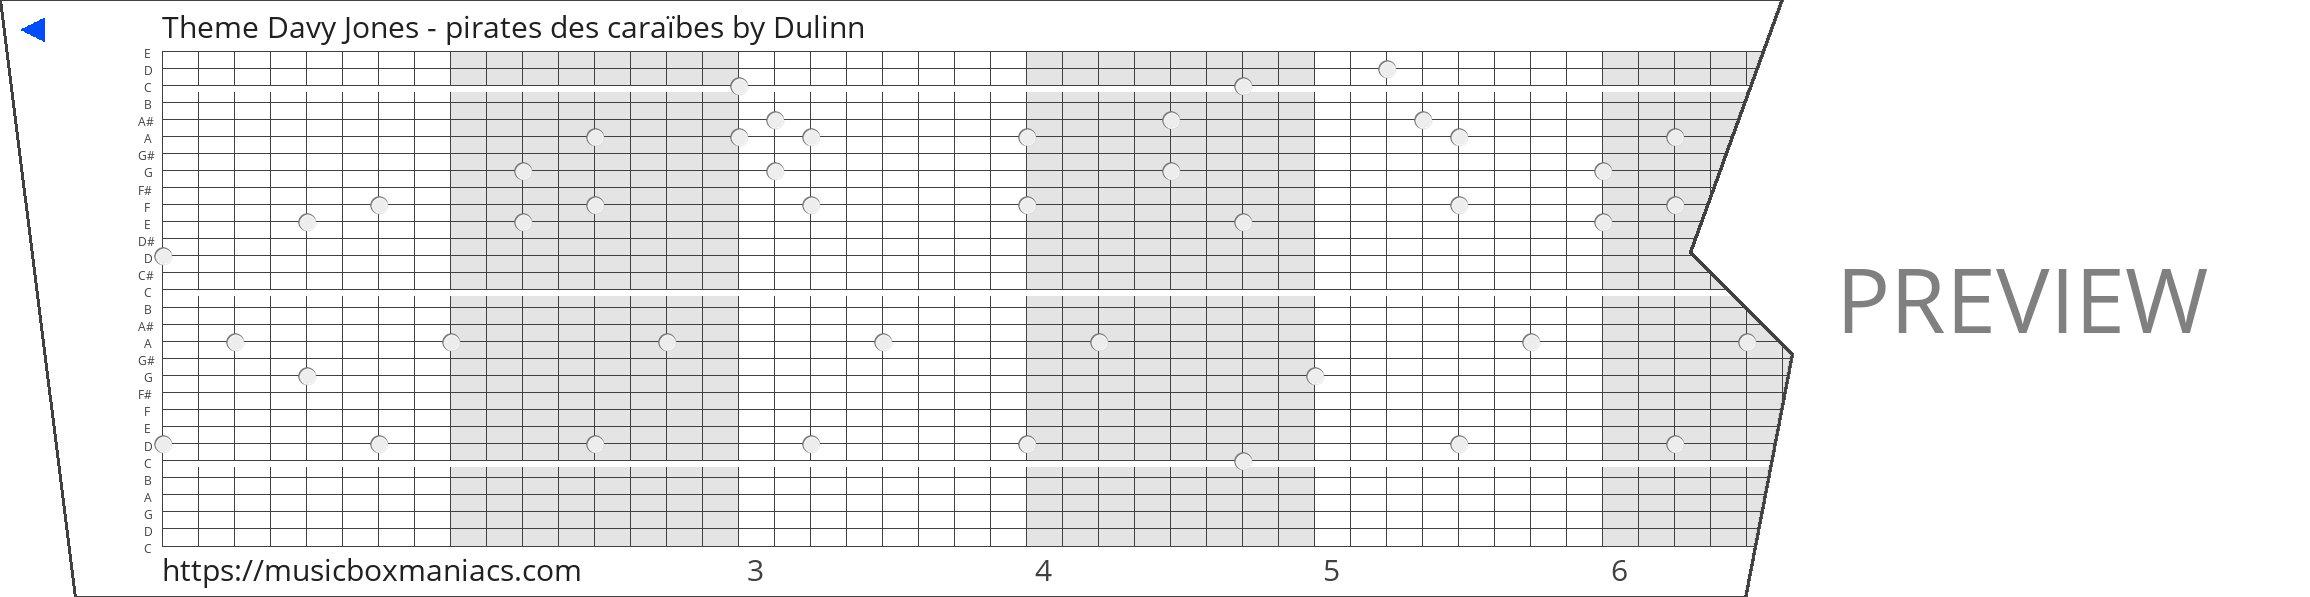 Theme Davy Jones - pirates des caraïbes 30 note music box paper strip